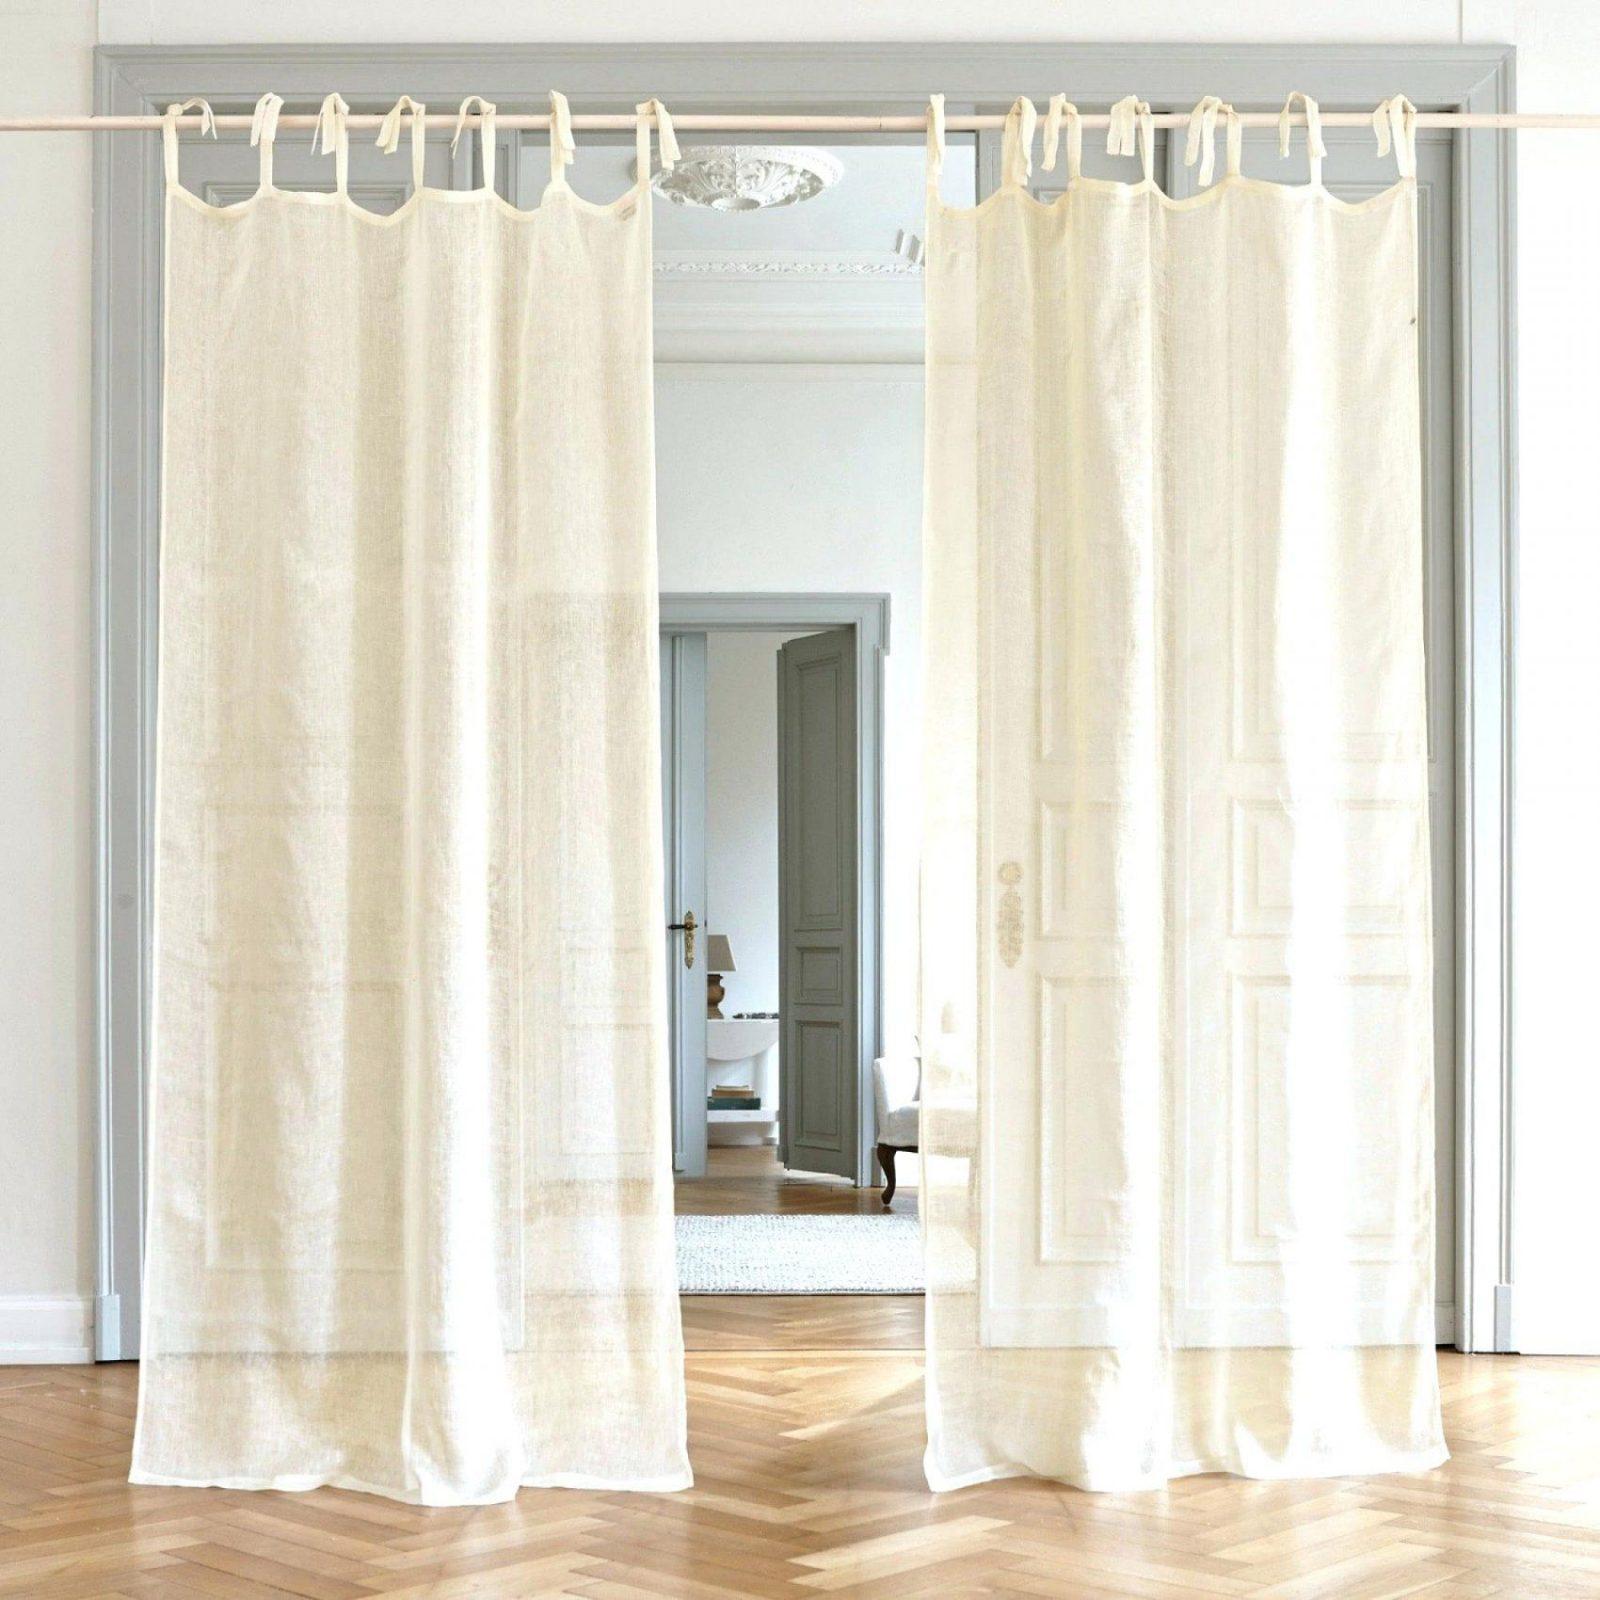 gardinen schienensystem ikea haus design ideen. Black Bedroom Furniture Sets. Home Design Ideas